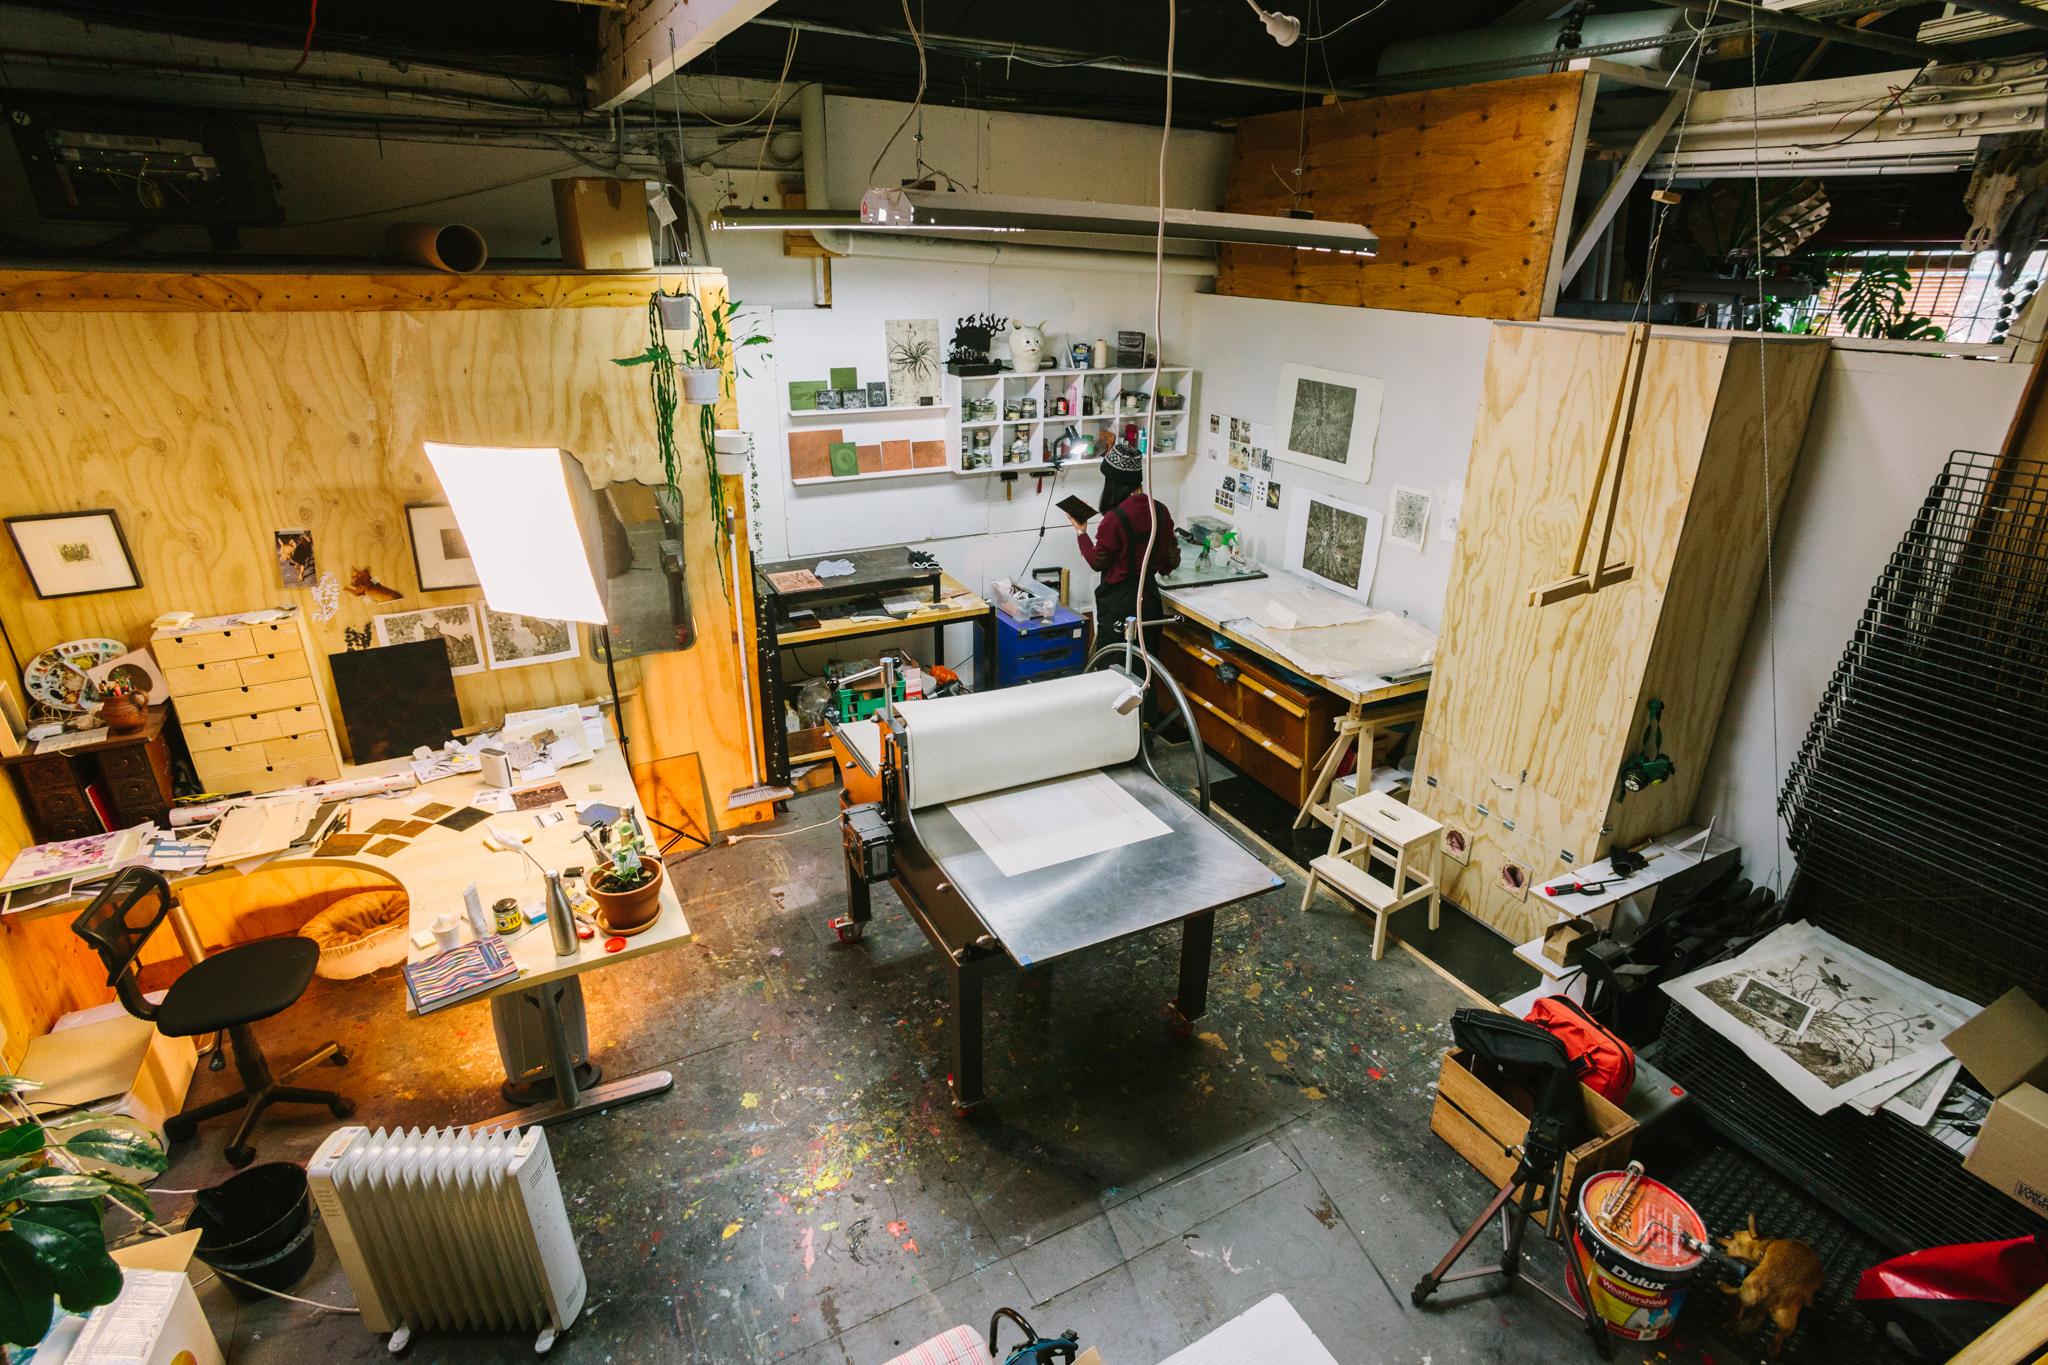 Kyoko Imazu – Artist Feature